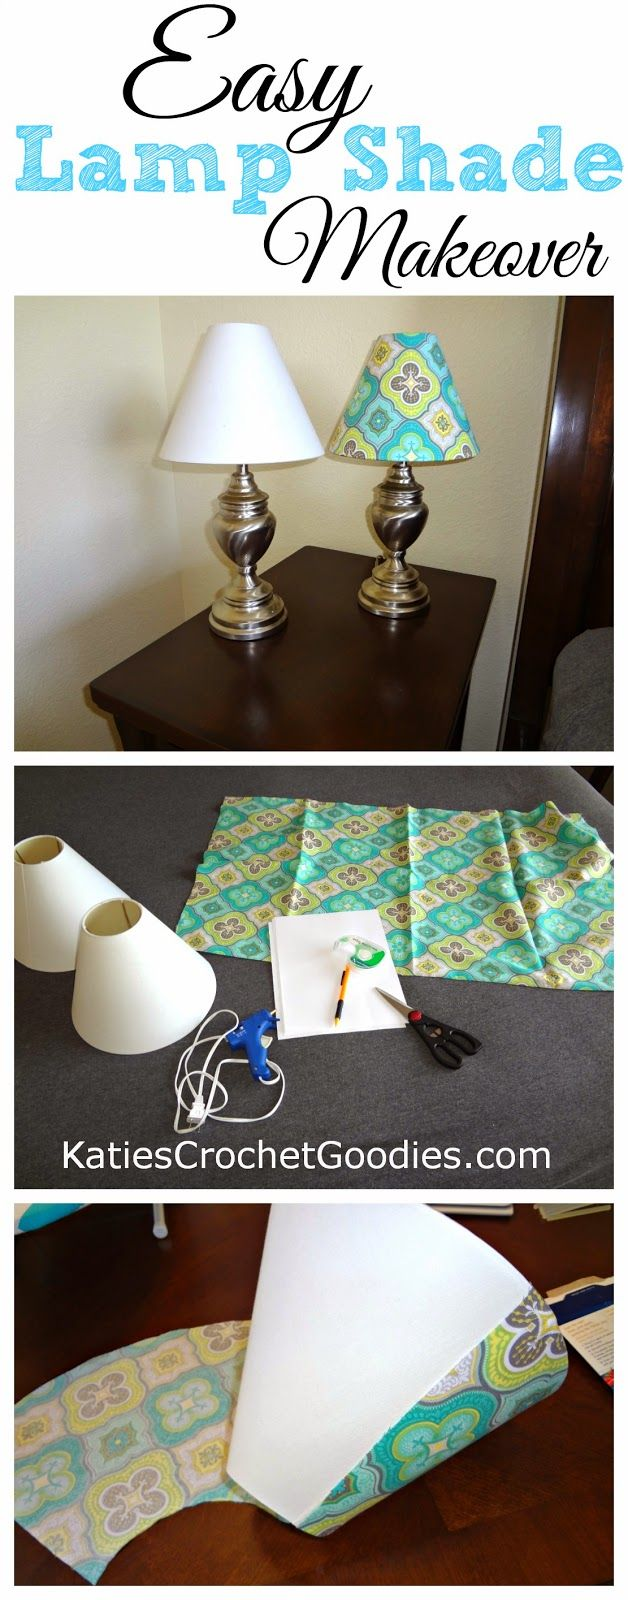 Diy recovering lamp shades lamp shade makeover tutorials and diy recovering lamp shades geotapseo Gallery